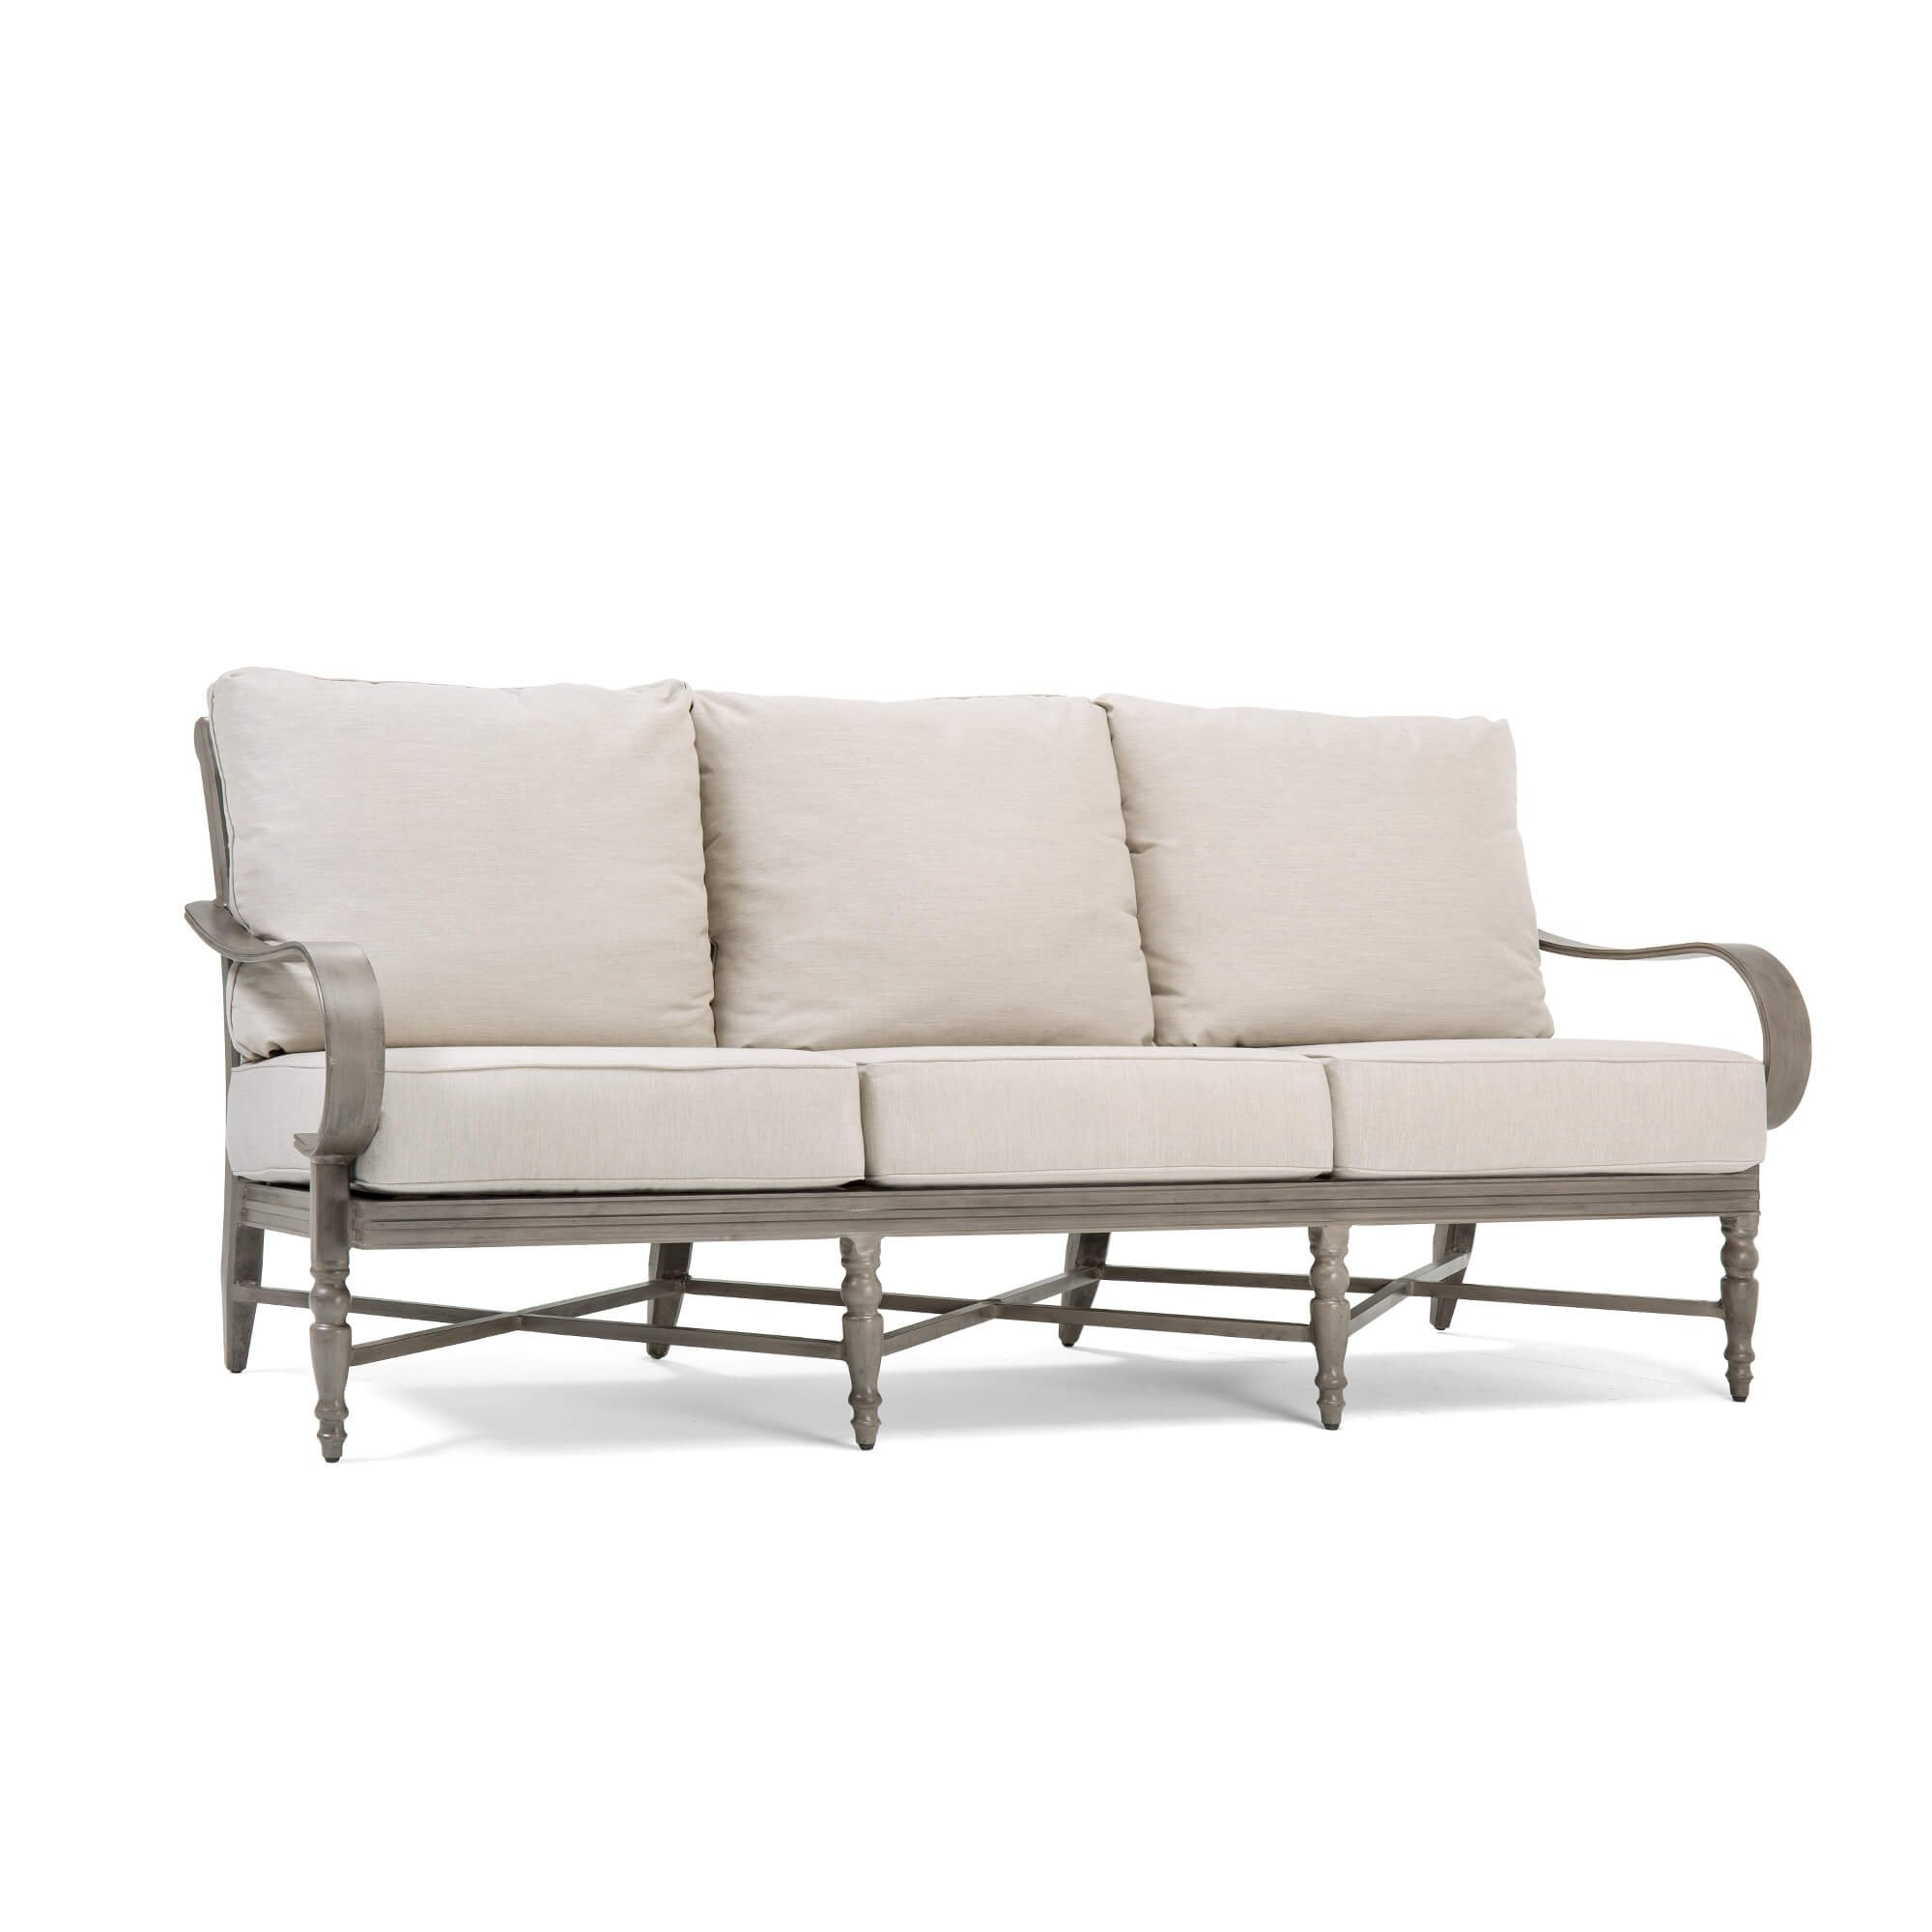 Blue Oak Outdoor Saylor Patio Furniture Sofa with Outdura Remy Sand Cushion